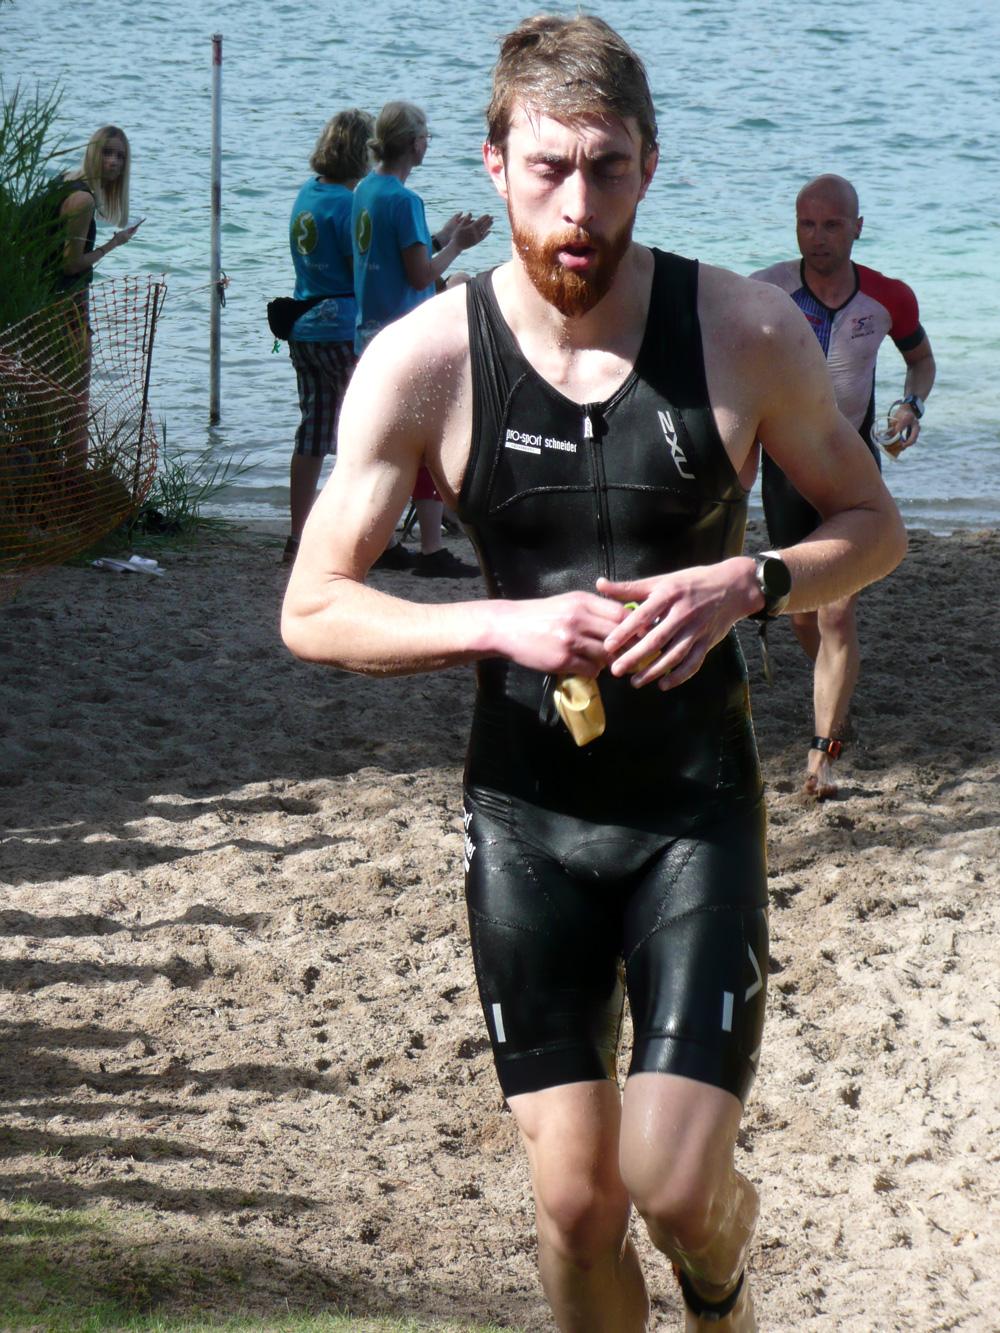 Summertime-Triathlon-Kraichgau-02.jpg